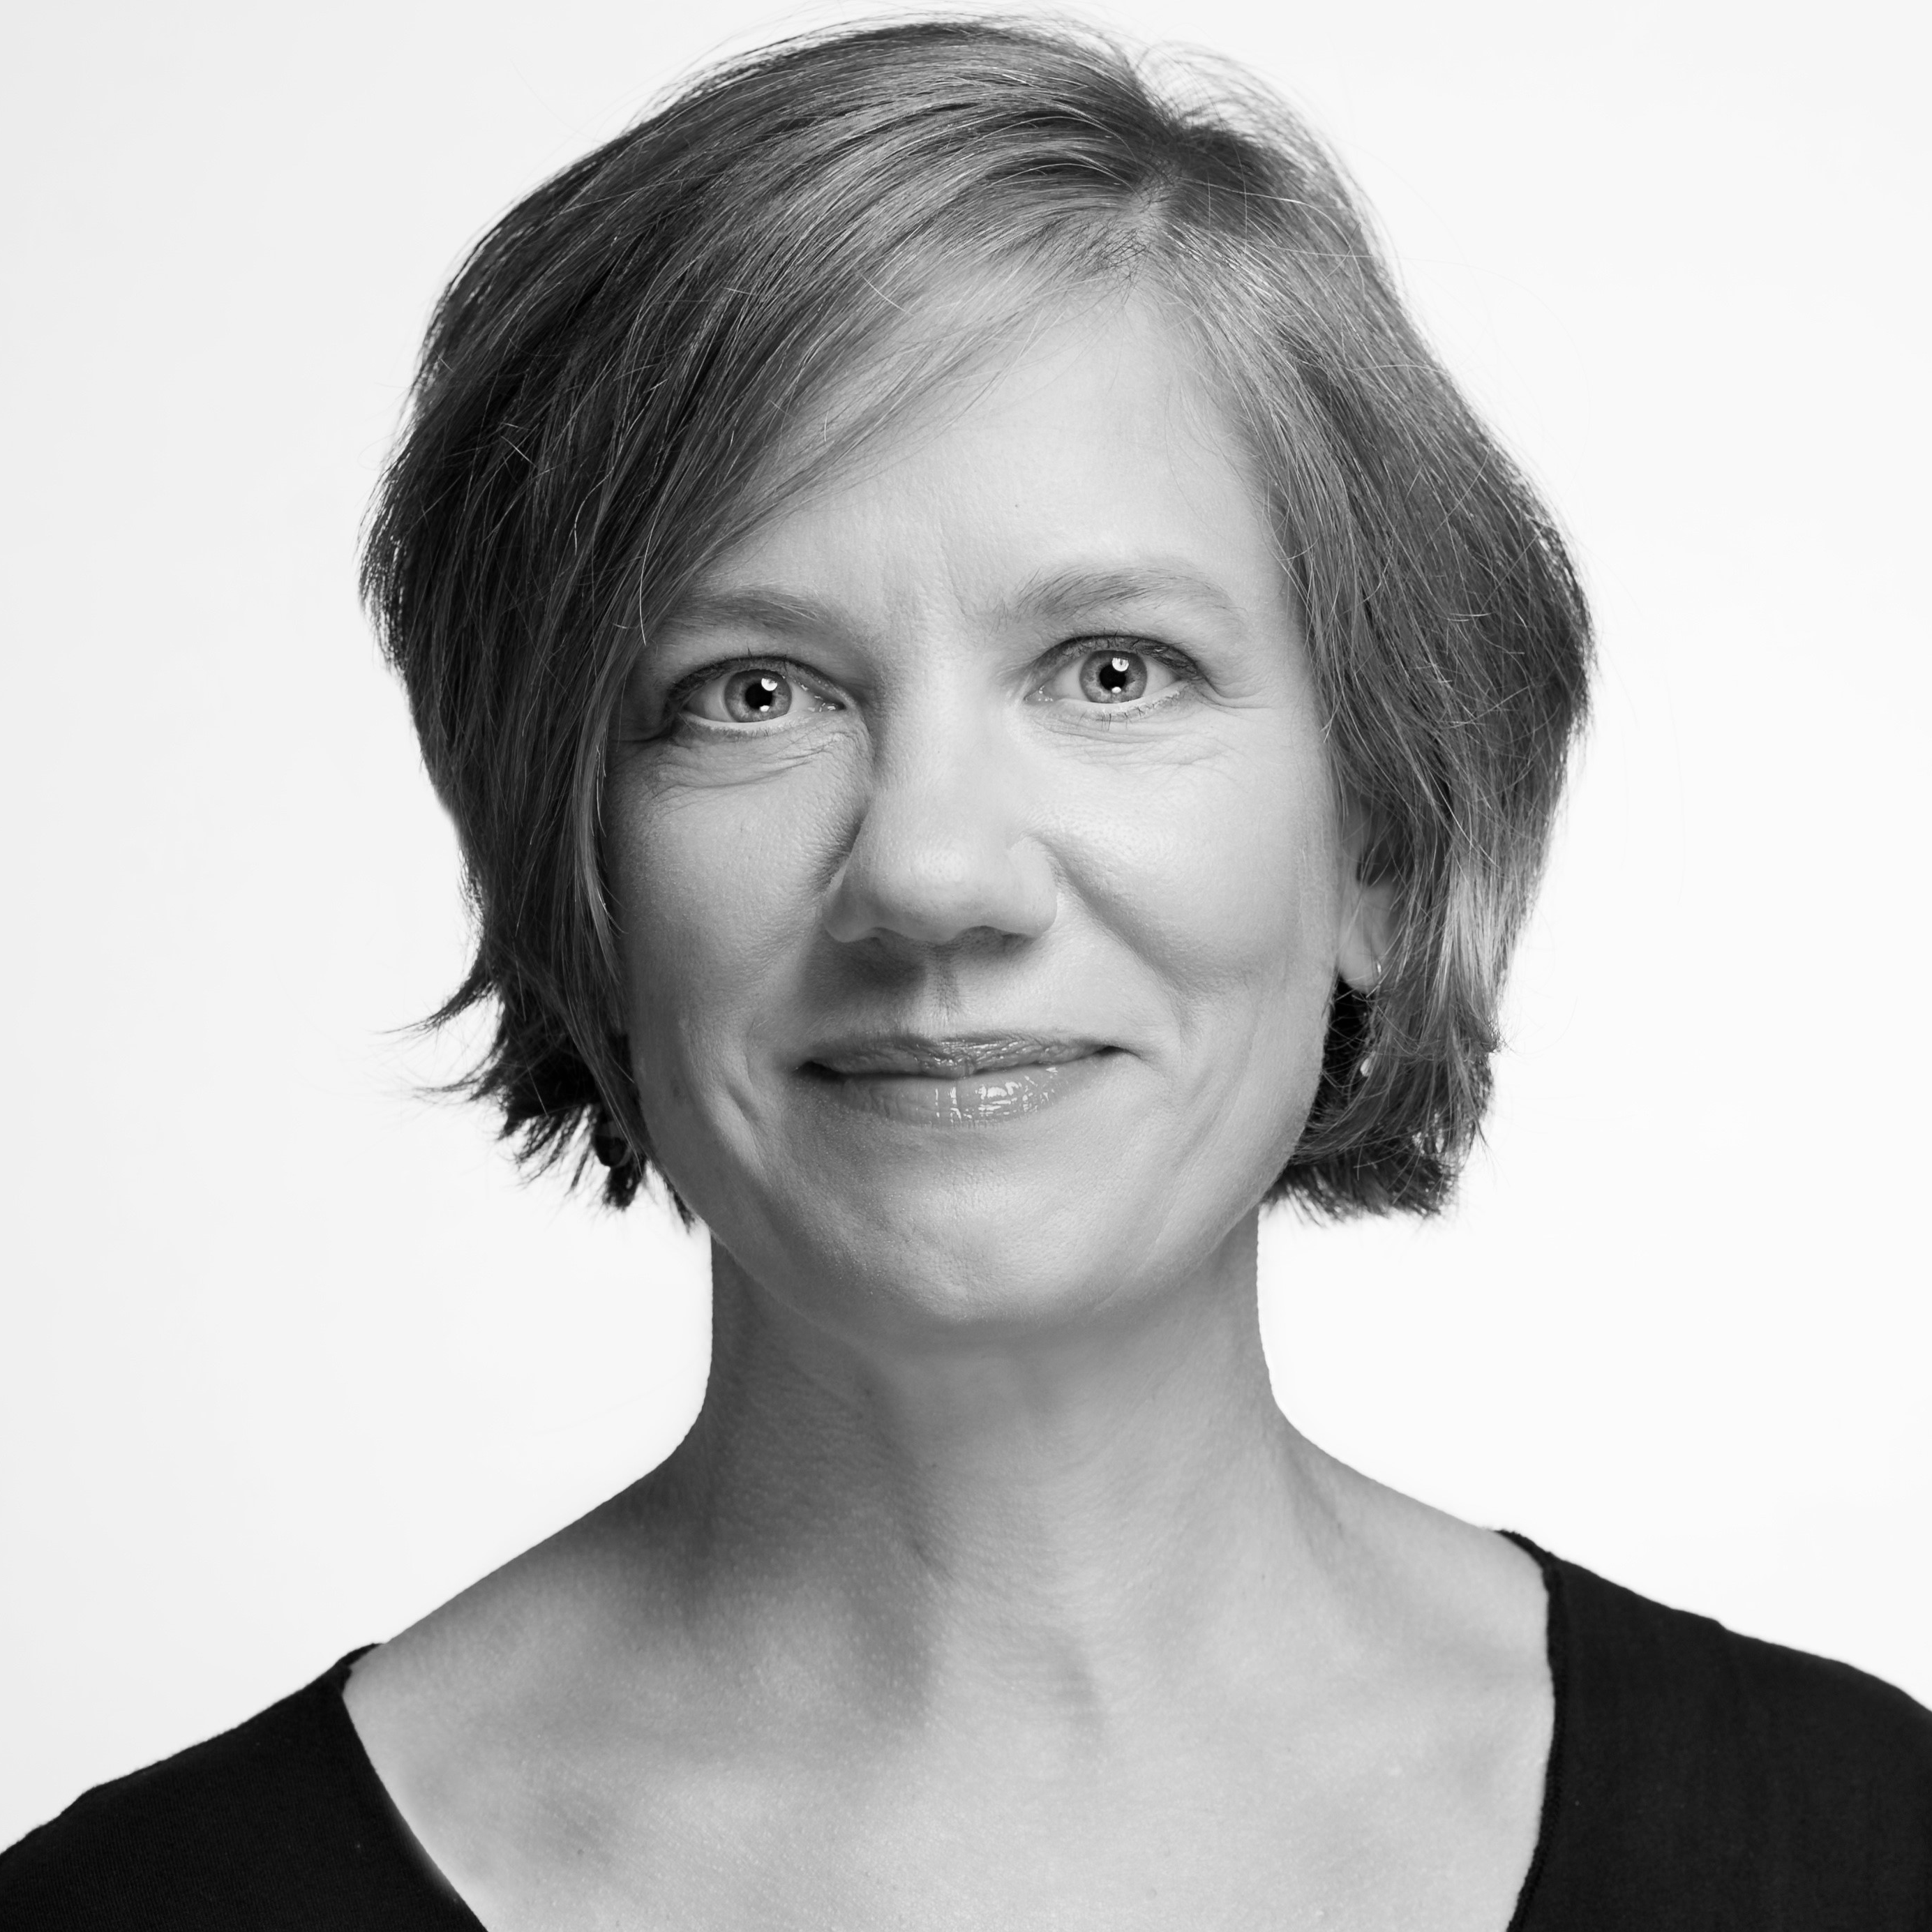 Dr. Nicole Werner